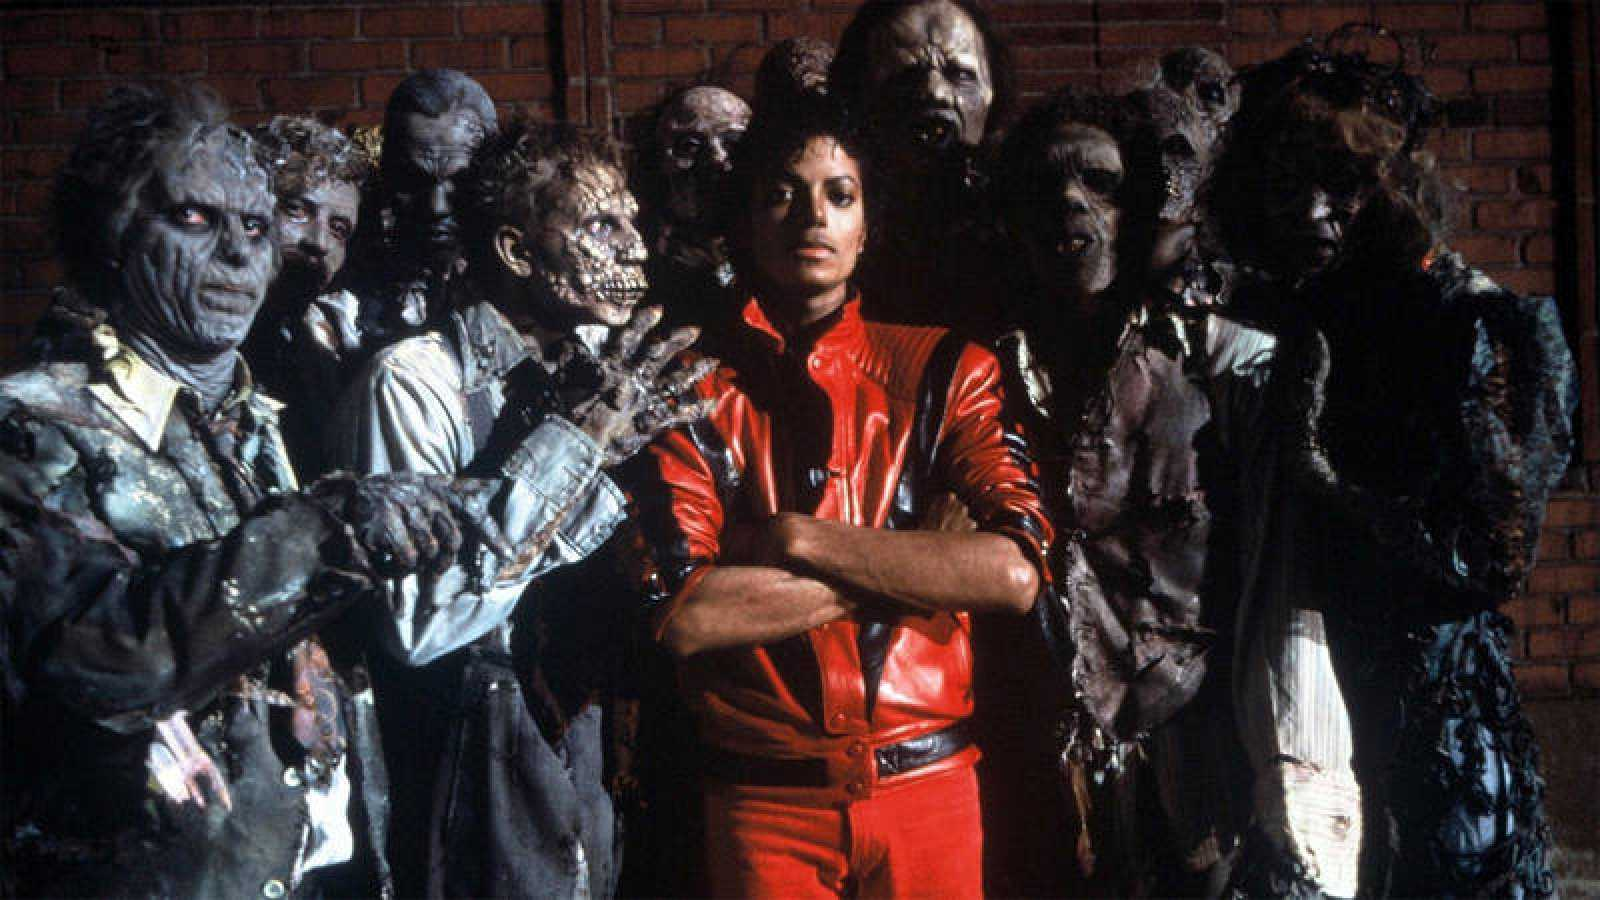 Fotograma del videoclip 'Thriller', de Michael Jackson.